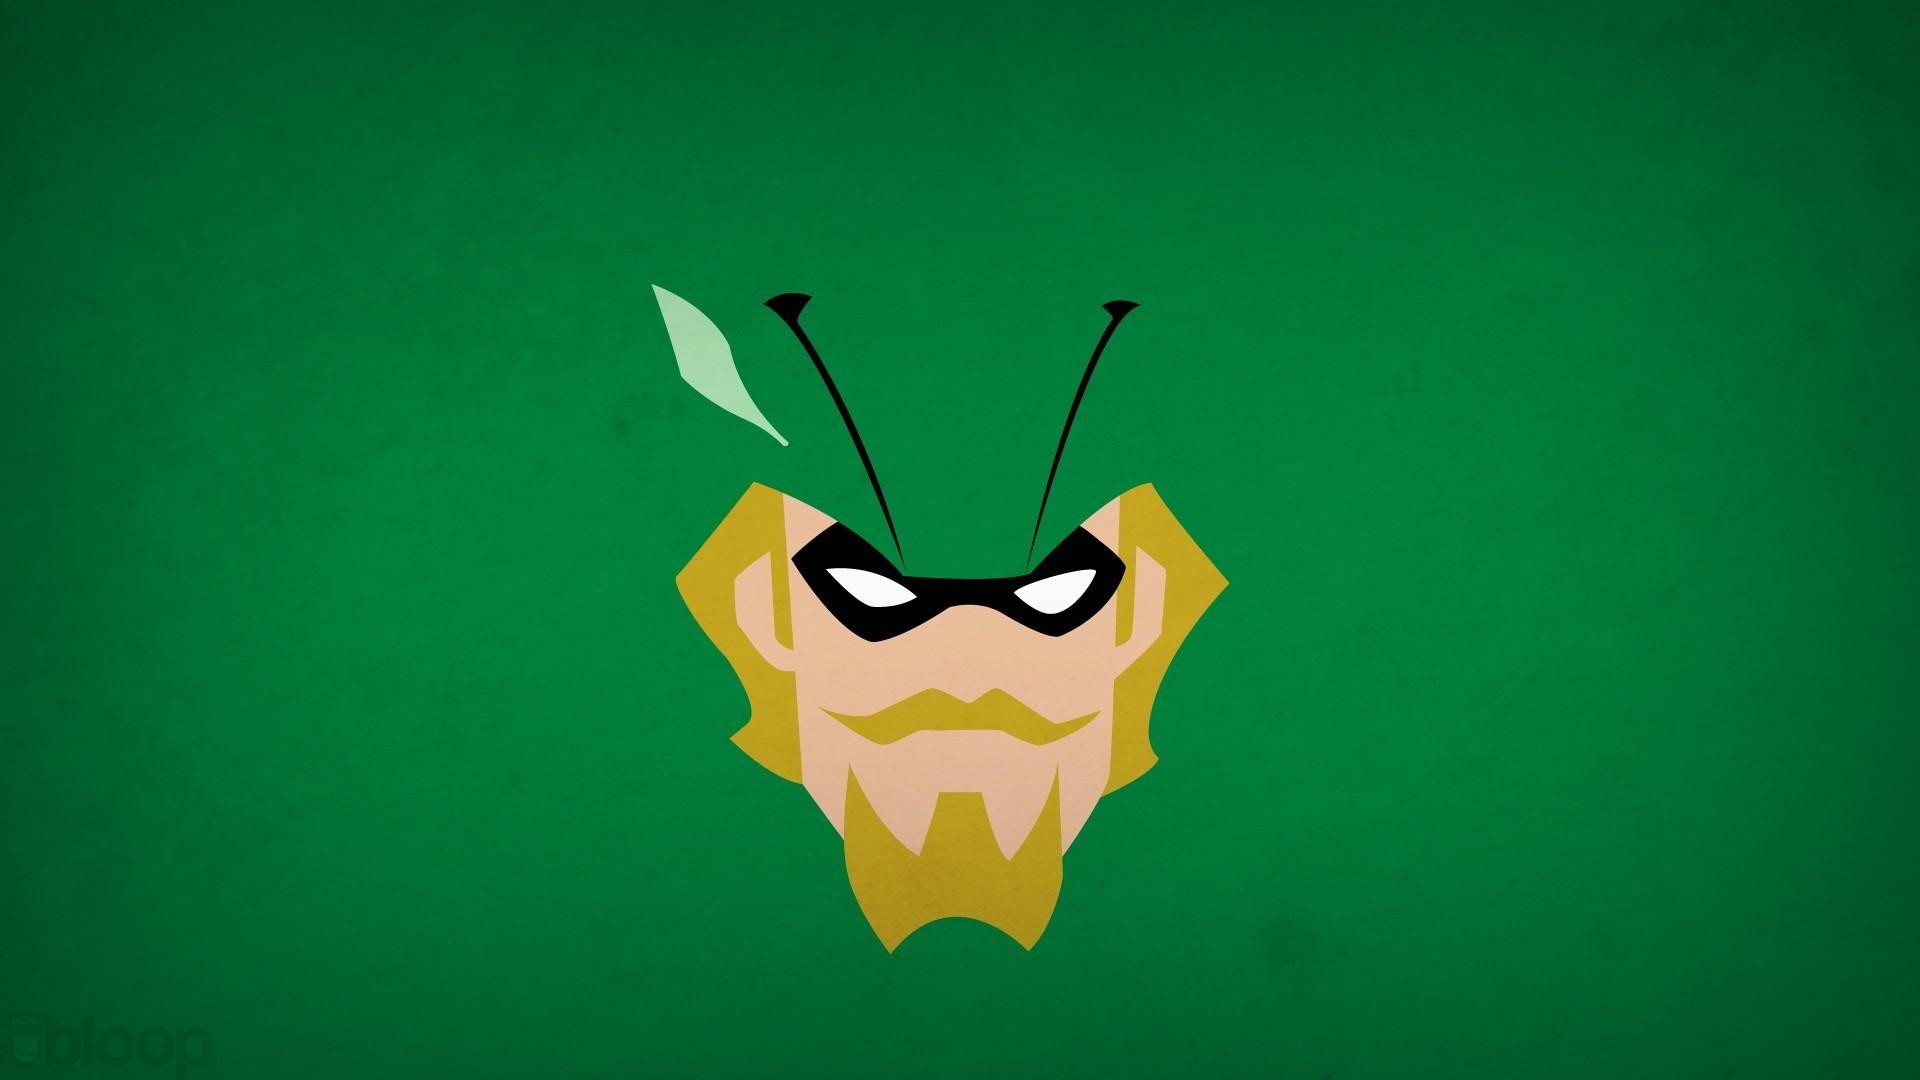 Green Arrow Minimalism 2048×1152 Resolution